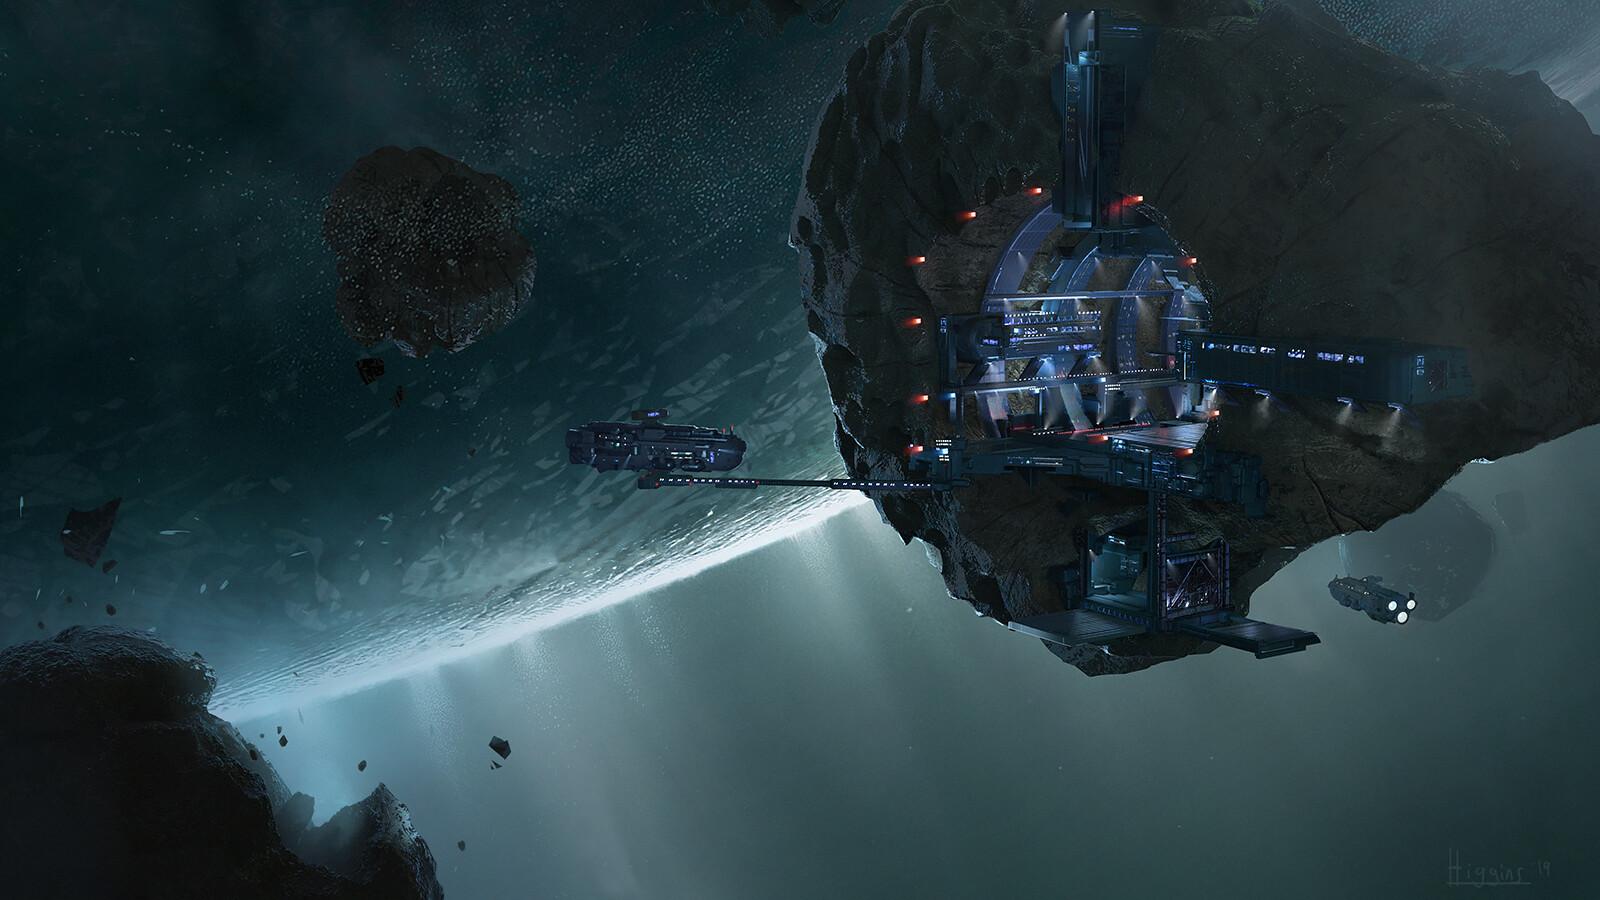 Brian higgins asteroid station web